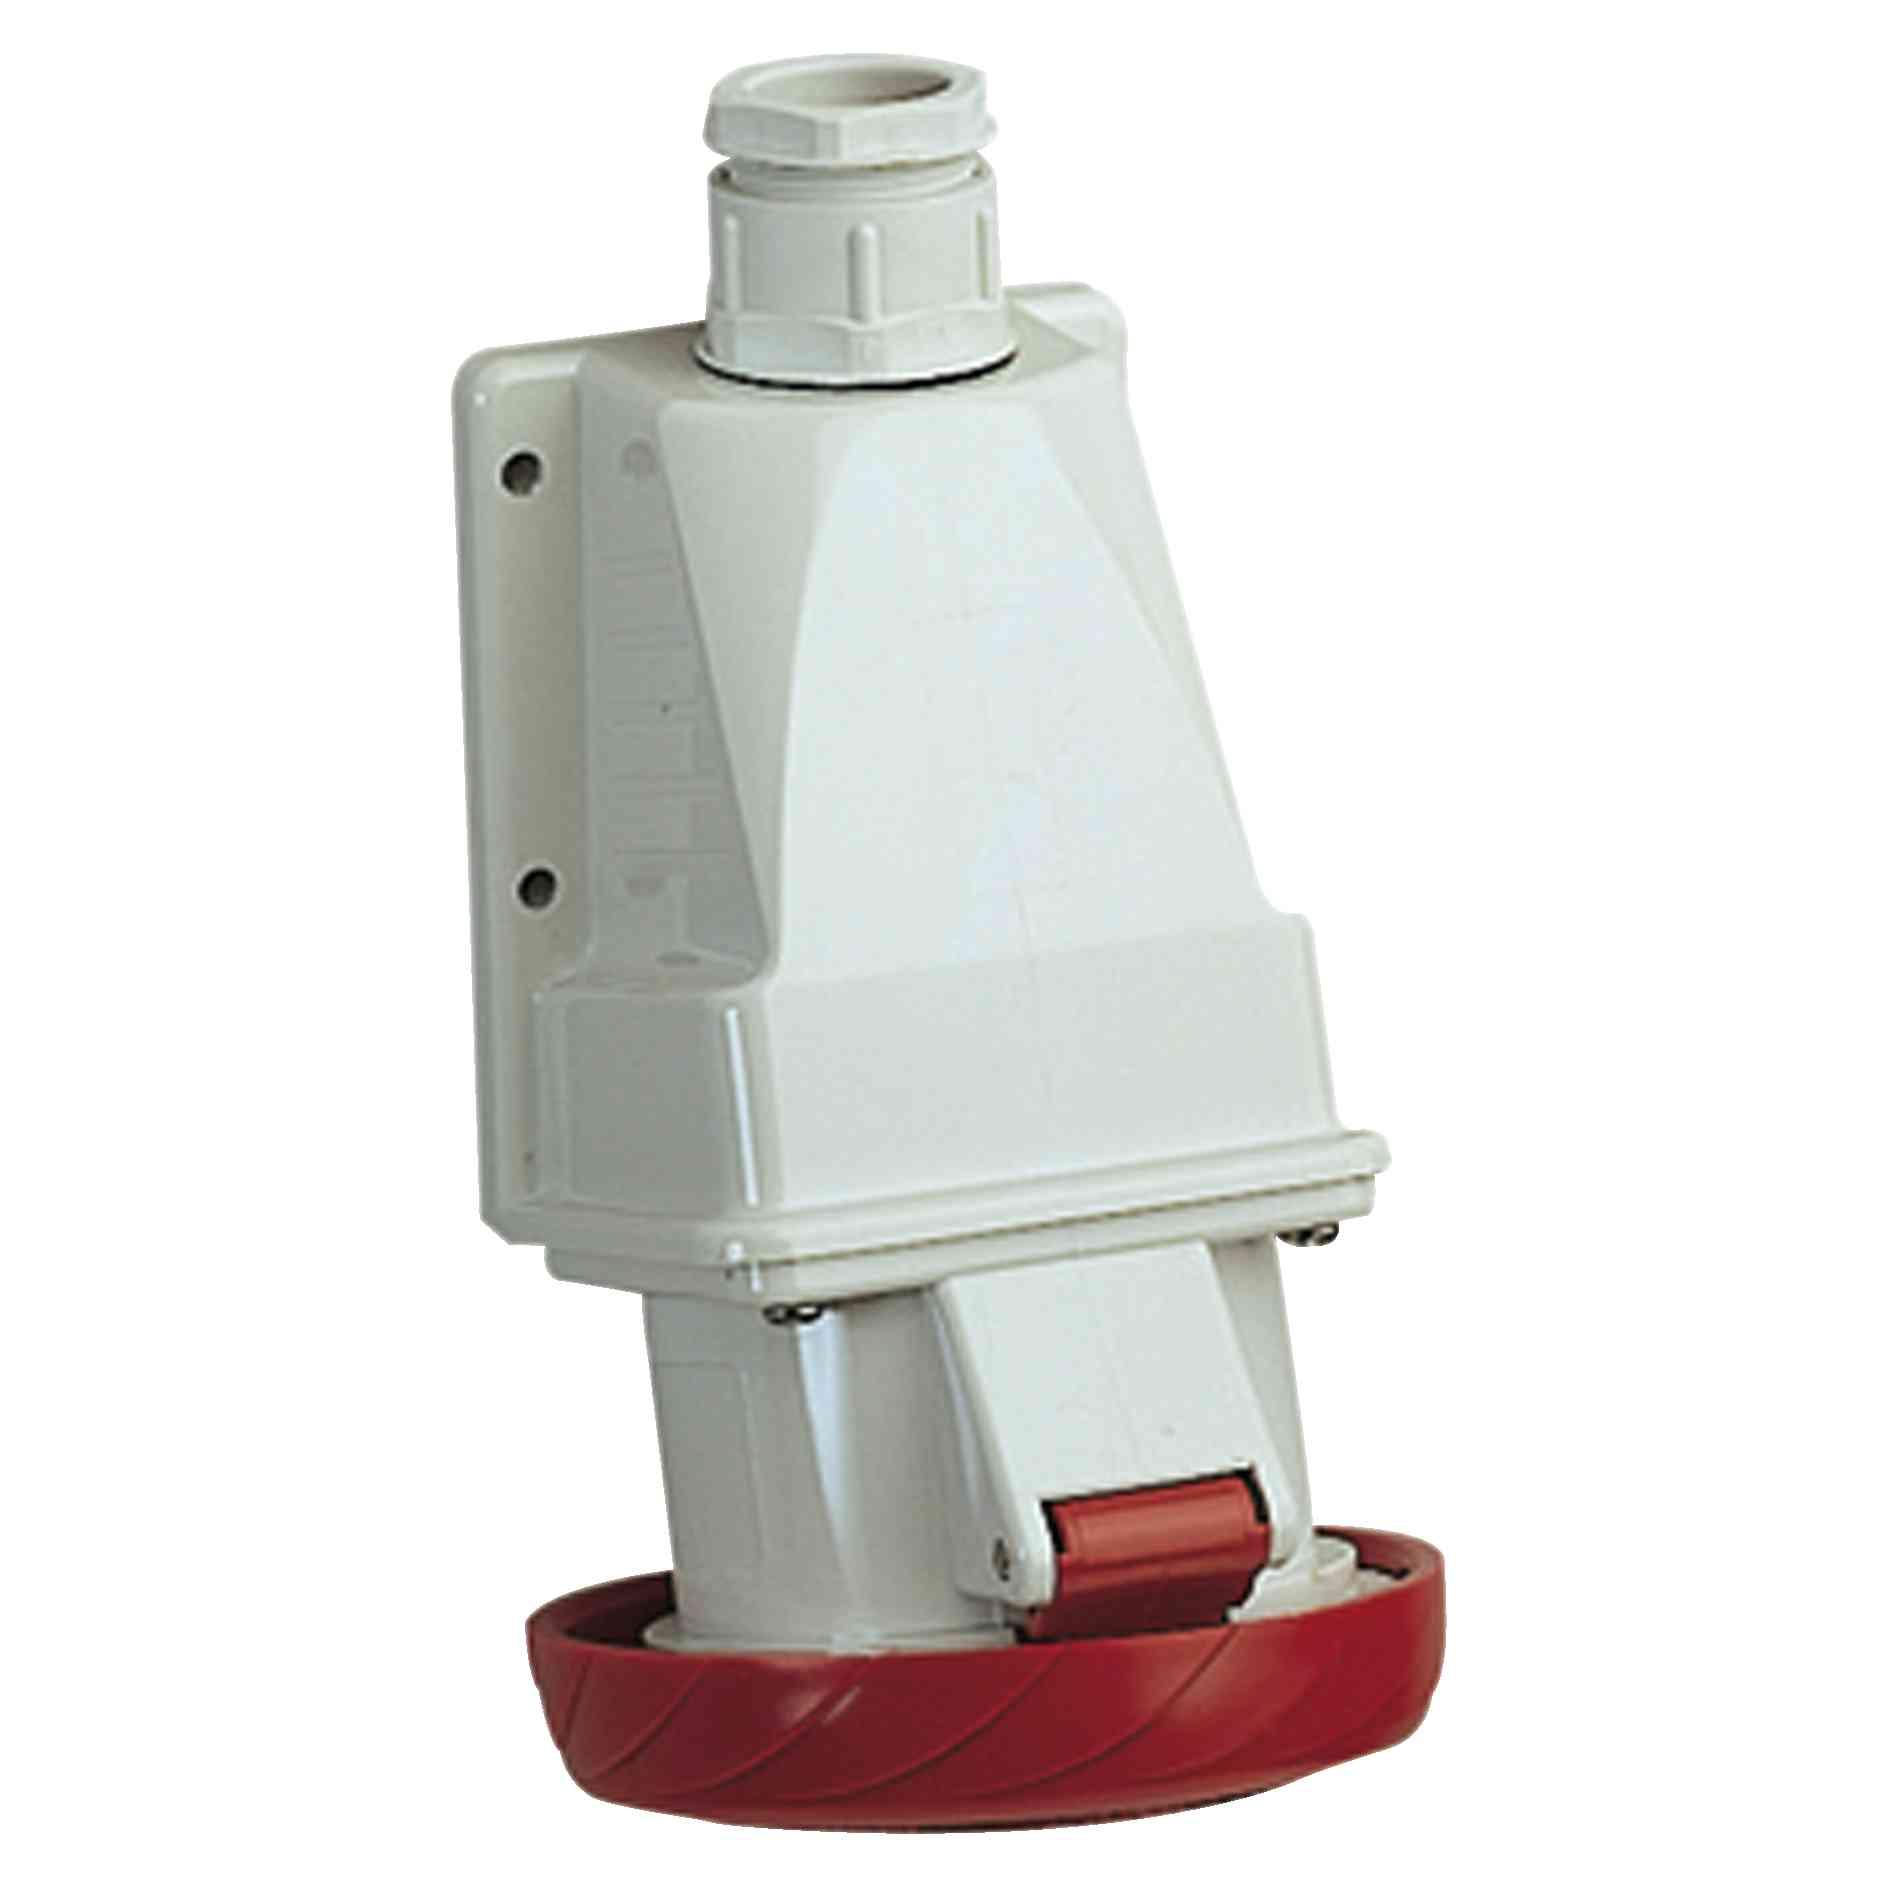 Vtičnica PratiKa - vijak - kotna - 16 A - 2P + E - 380 do 415 V AC - stena